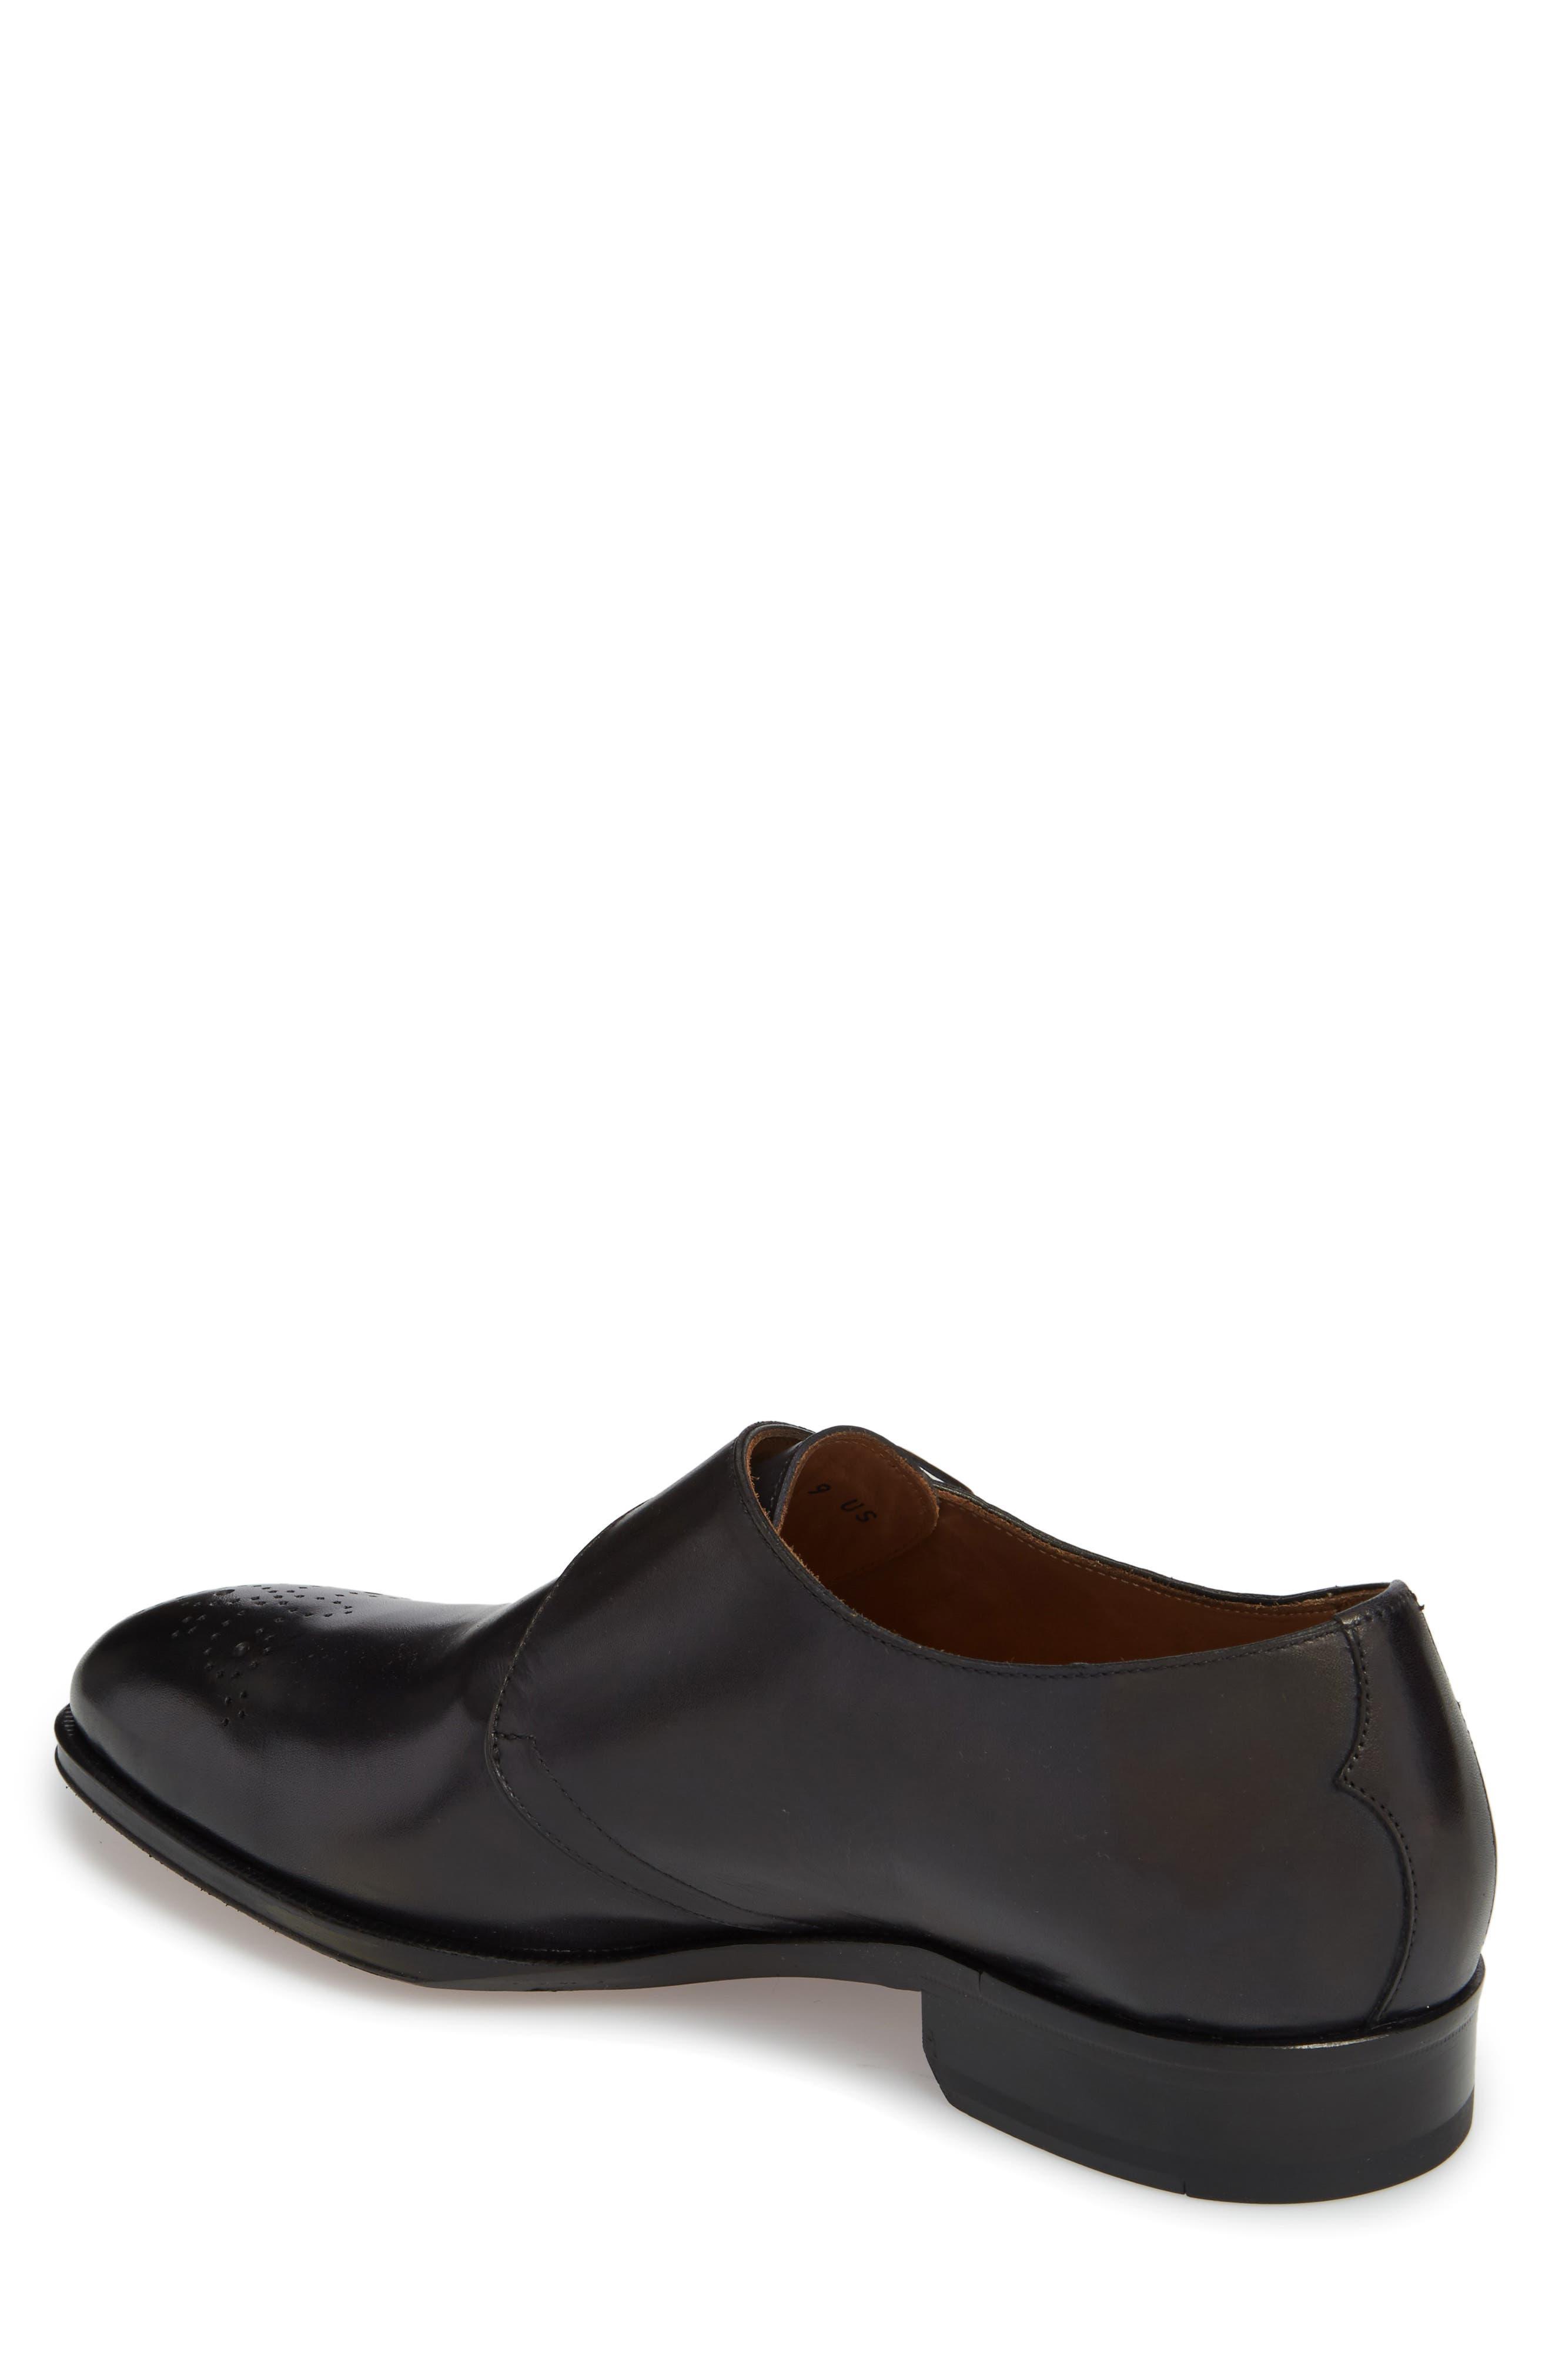 Gallo Bianco Bologna Monk Strap Shoe,                             Alternate thumbnail 2, color,                             Anthracite